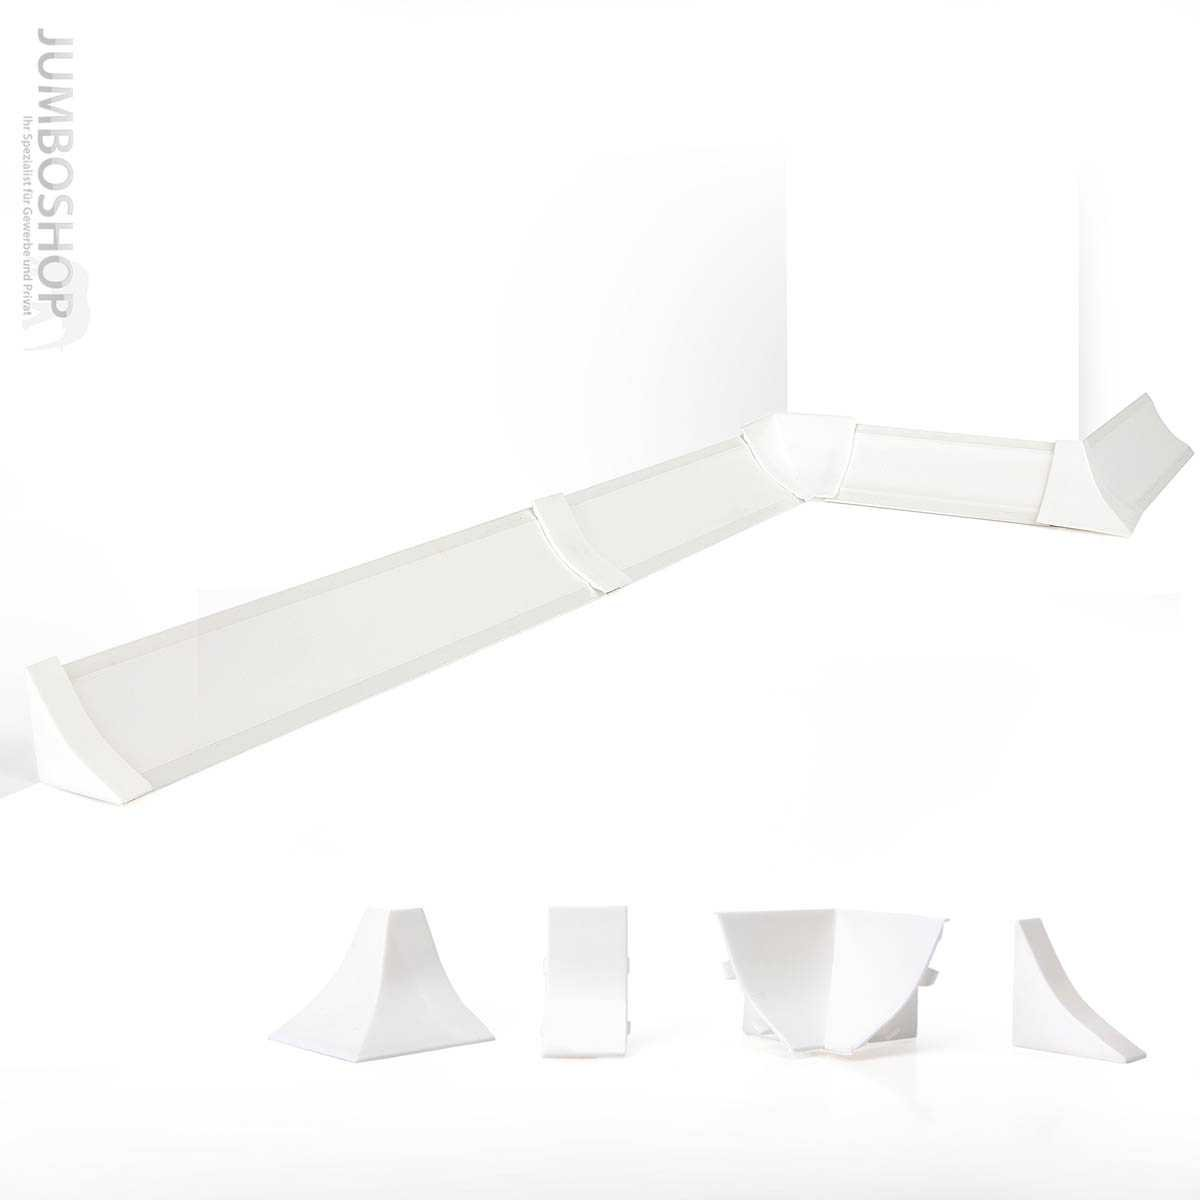 Beautiful Schubladen Ordnungssystem Küche Images - Milbank.us ...